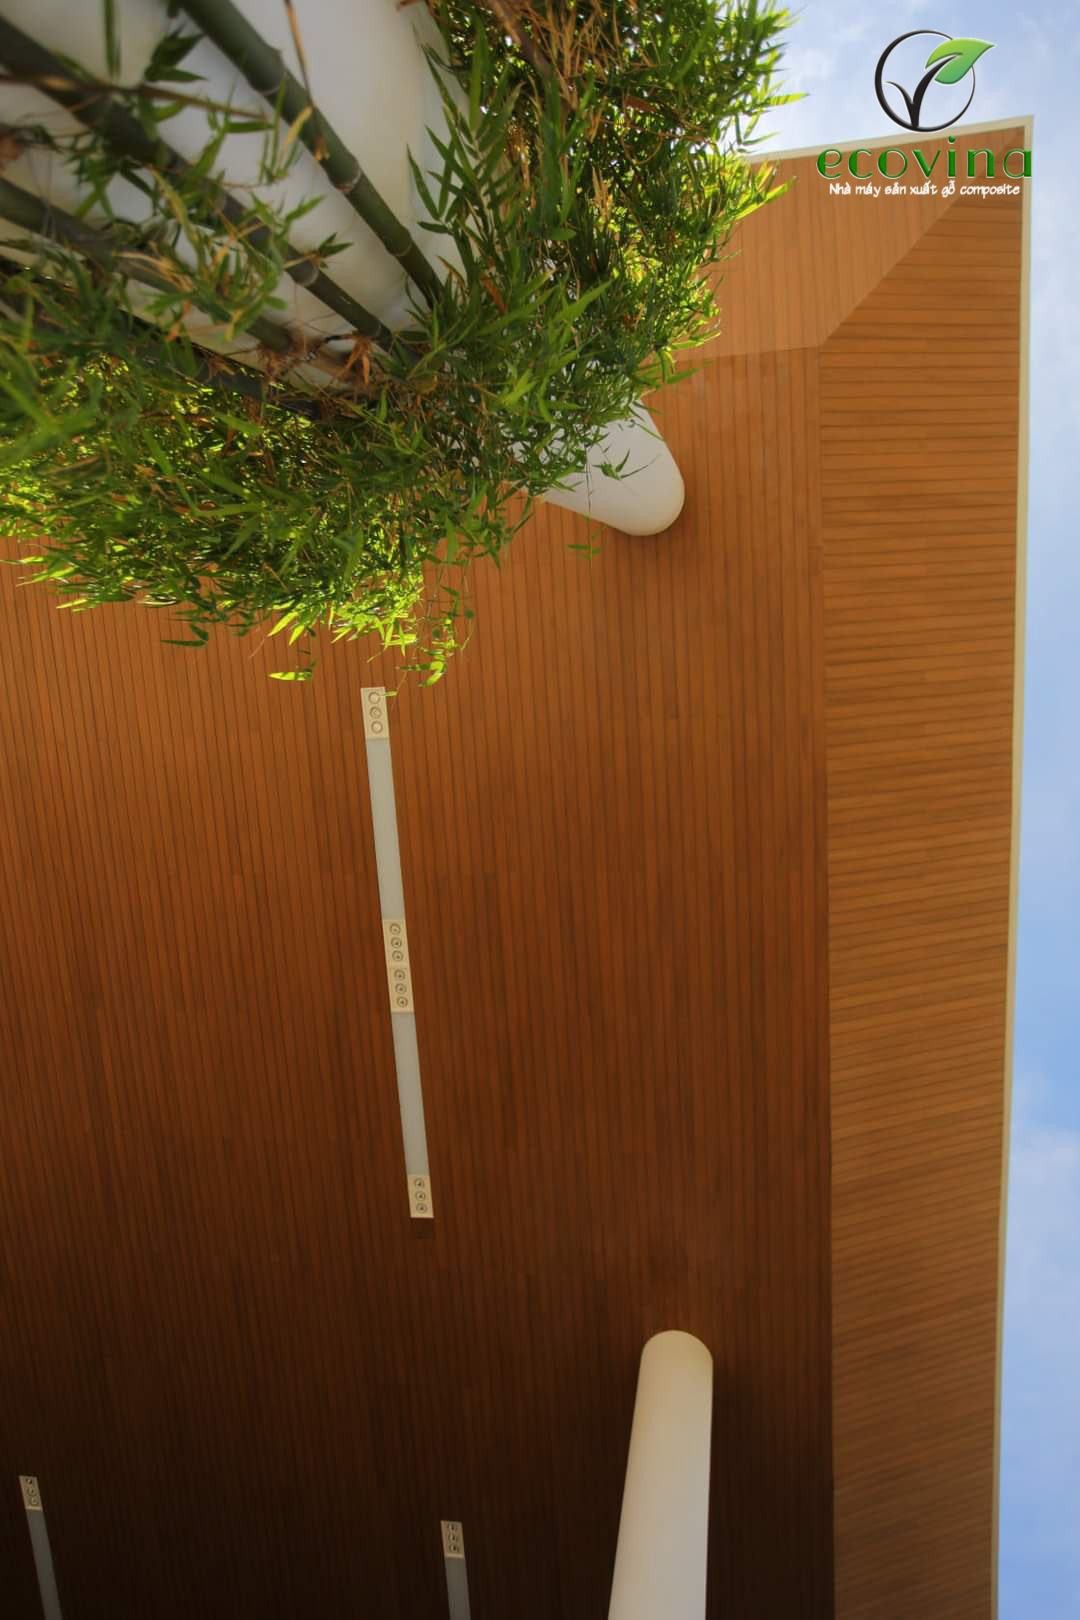 Tấm nhựa giả gỗ ốp trần